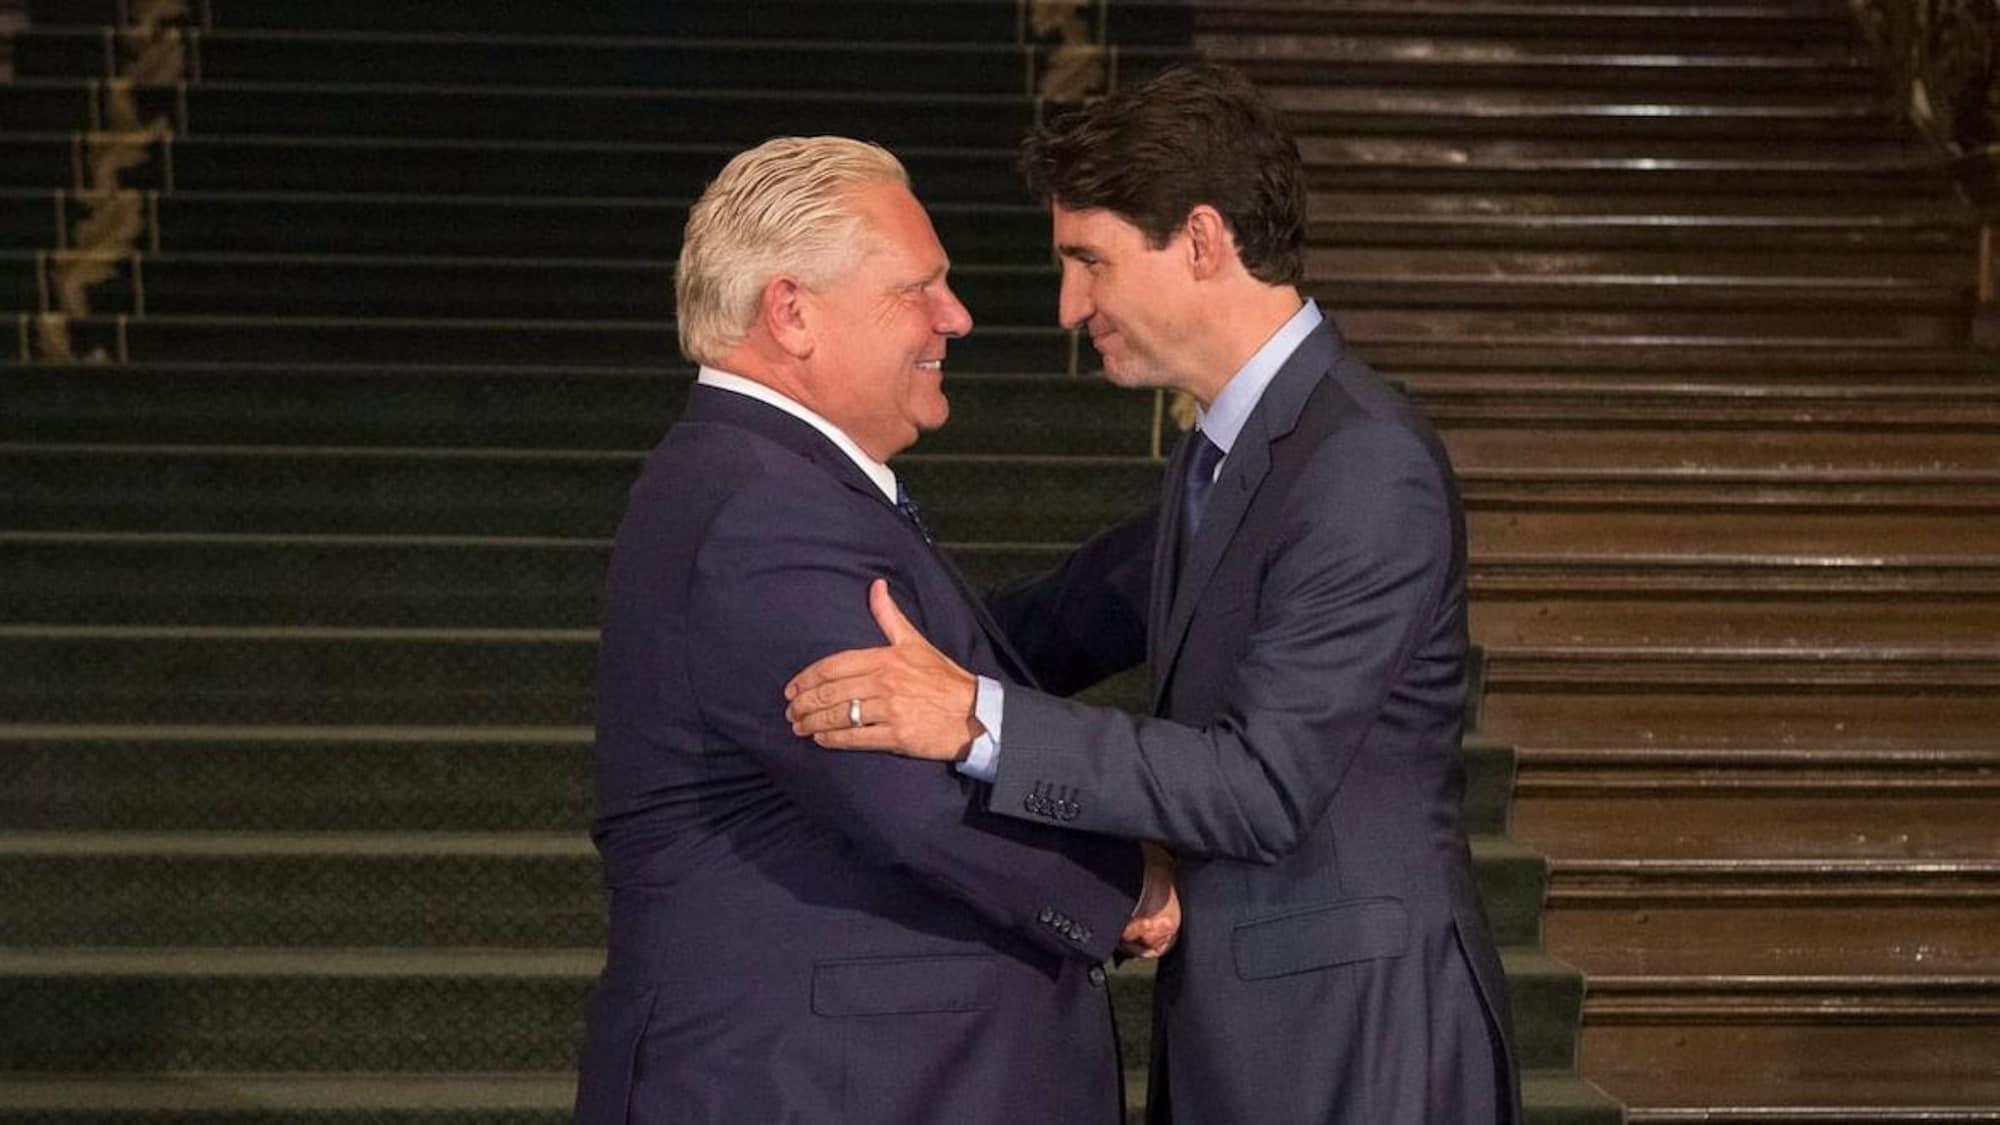 Doug Ford et Justin Trudeau se serre la main.